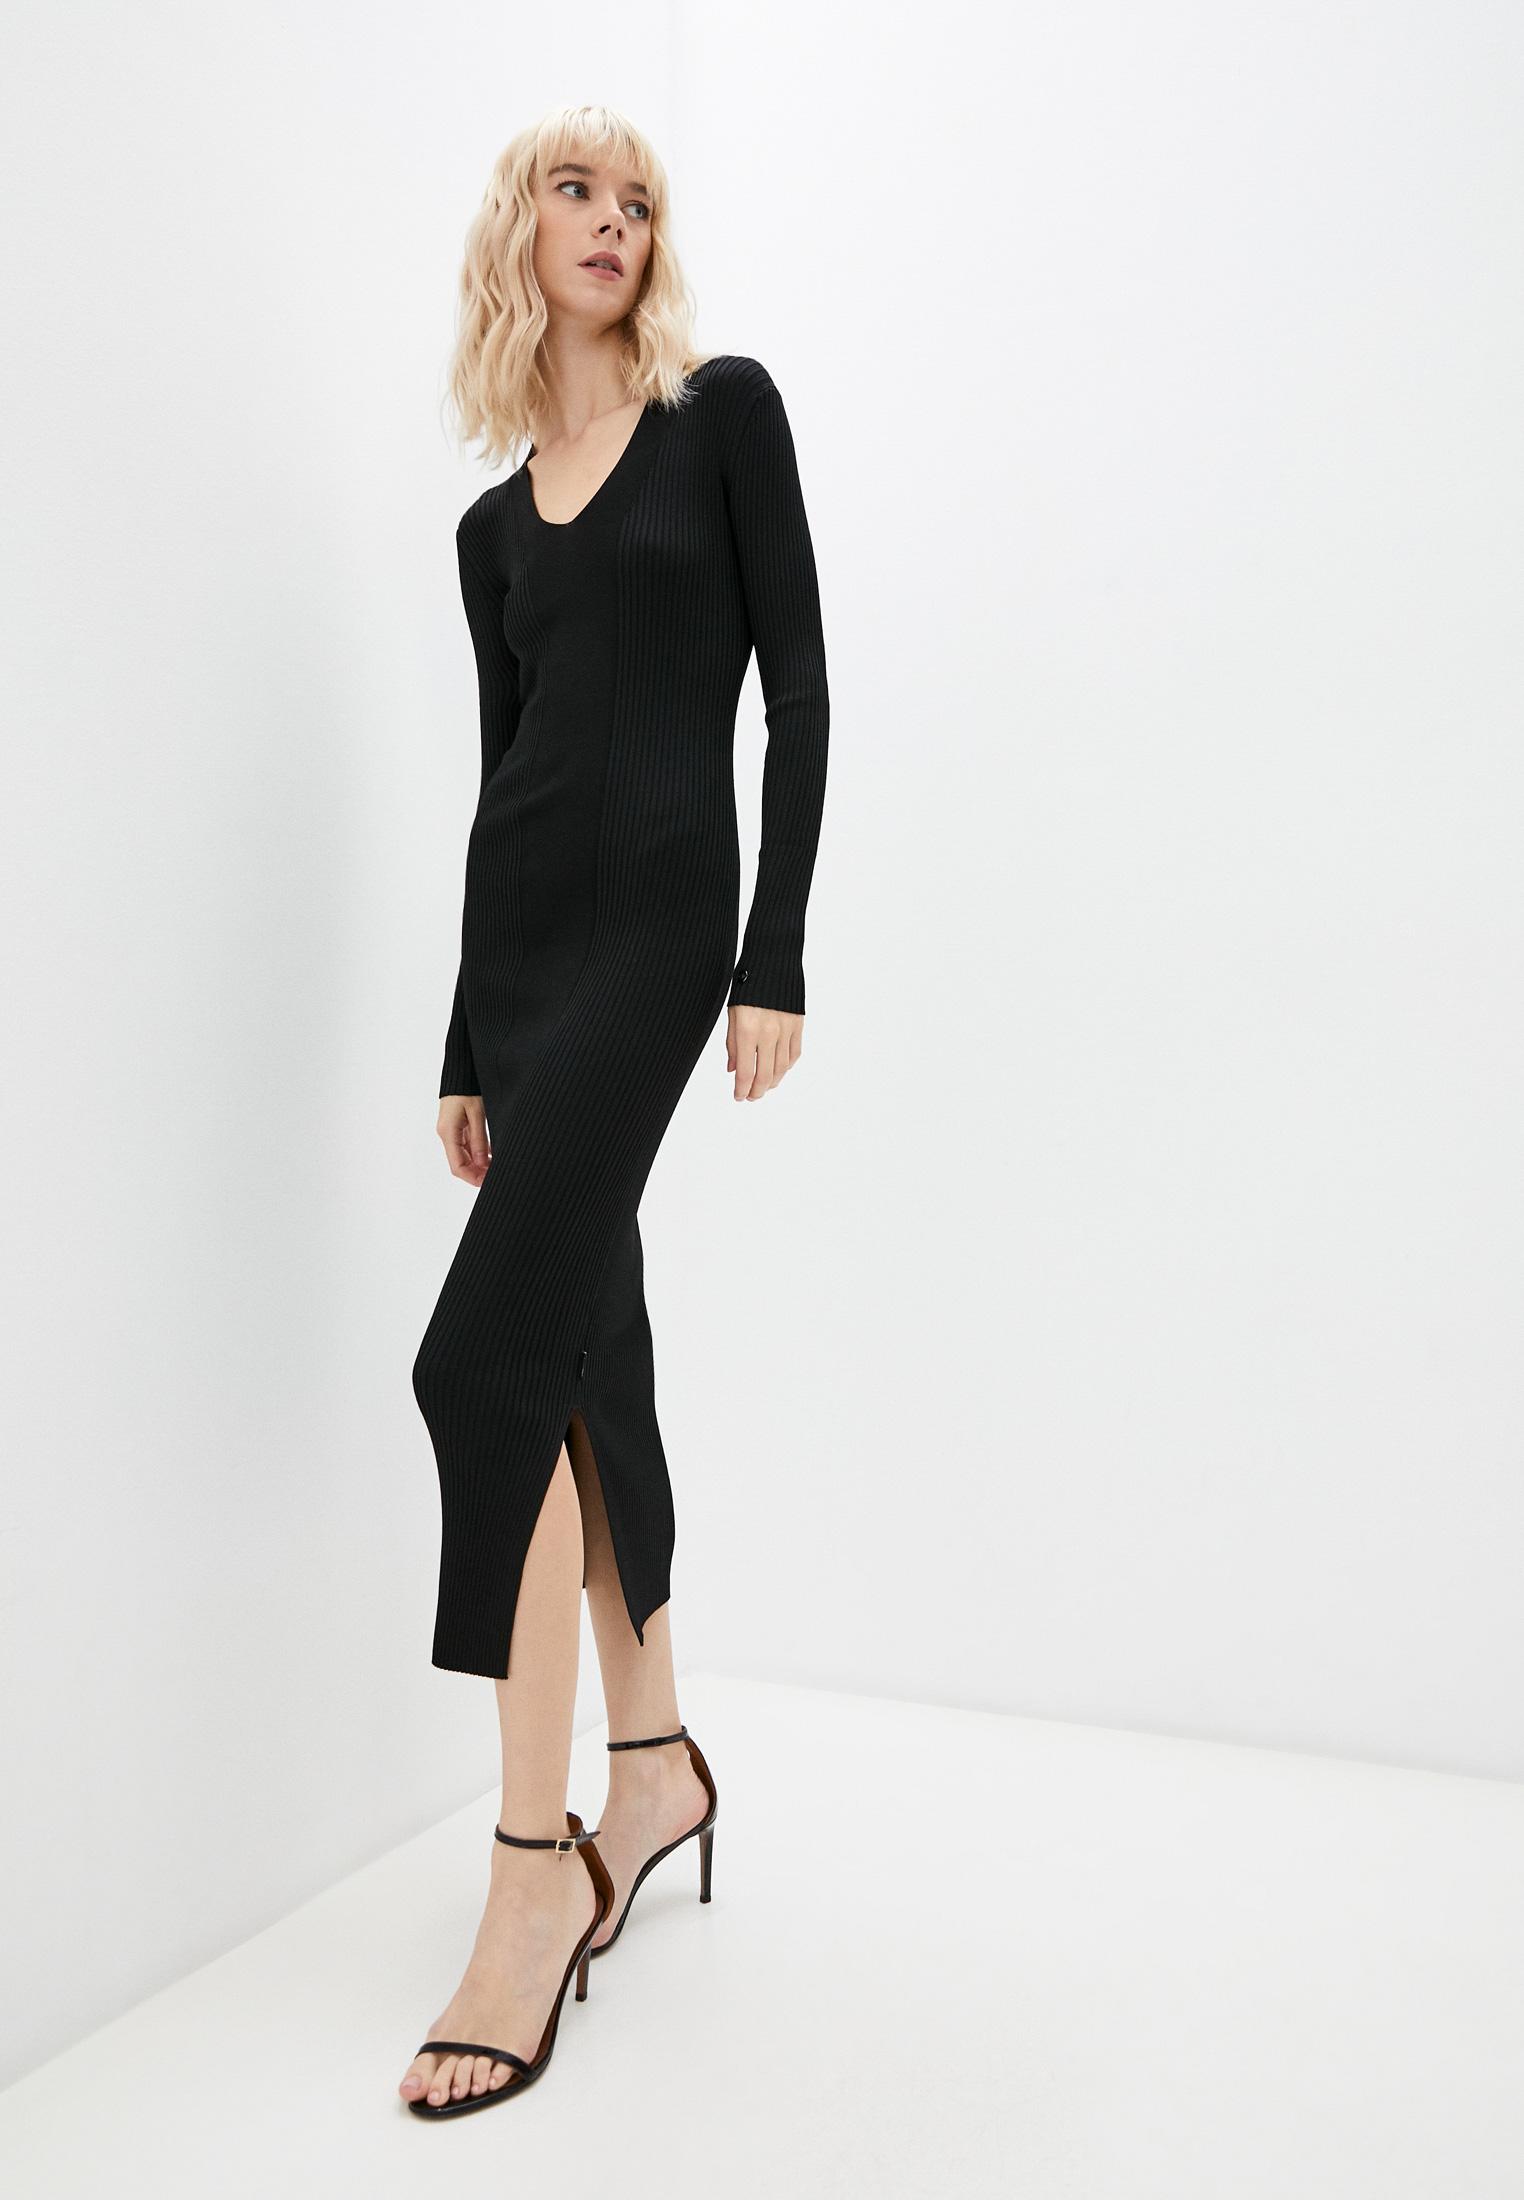 Вязаное платье Calvin Klein (Кельвин Кляйн) Платье Calvin Klein